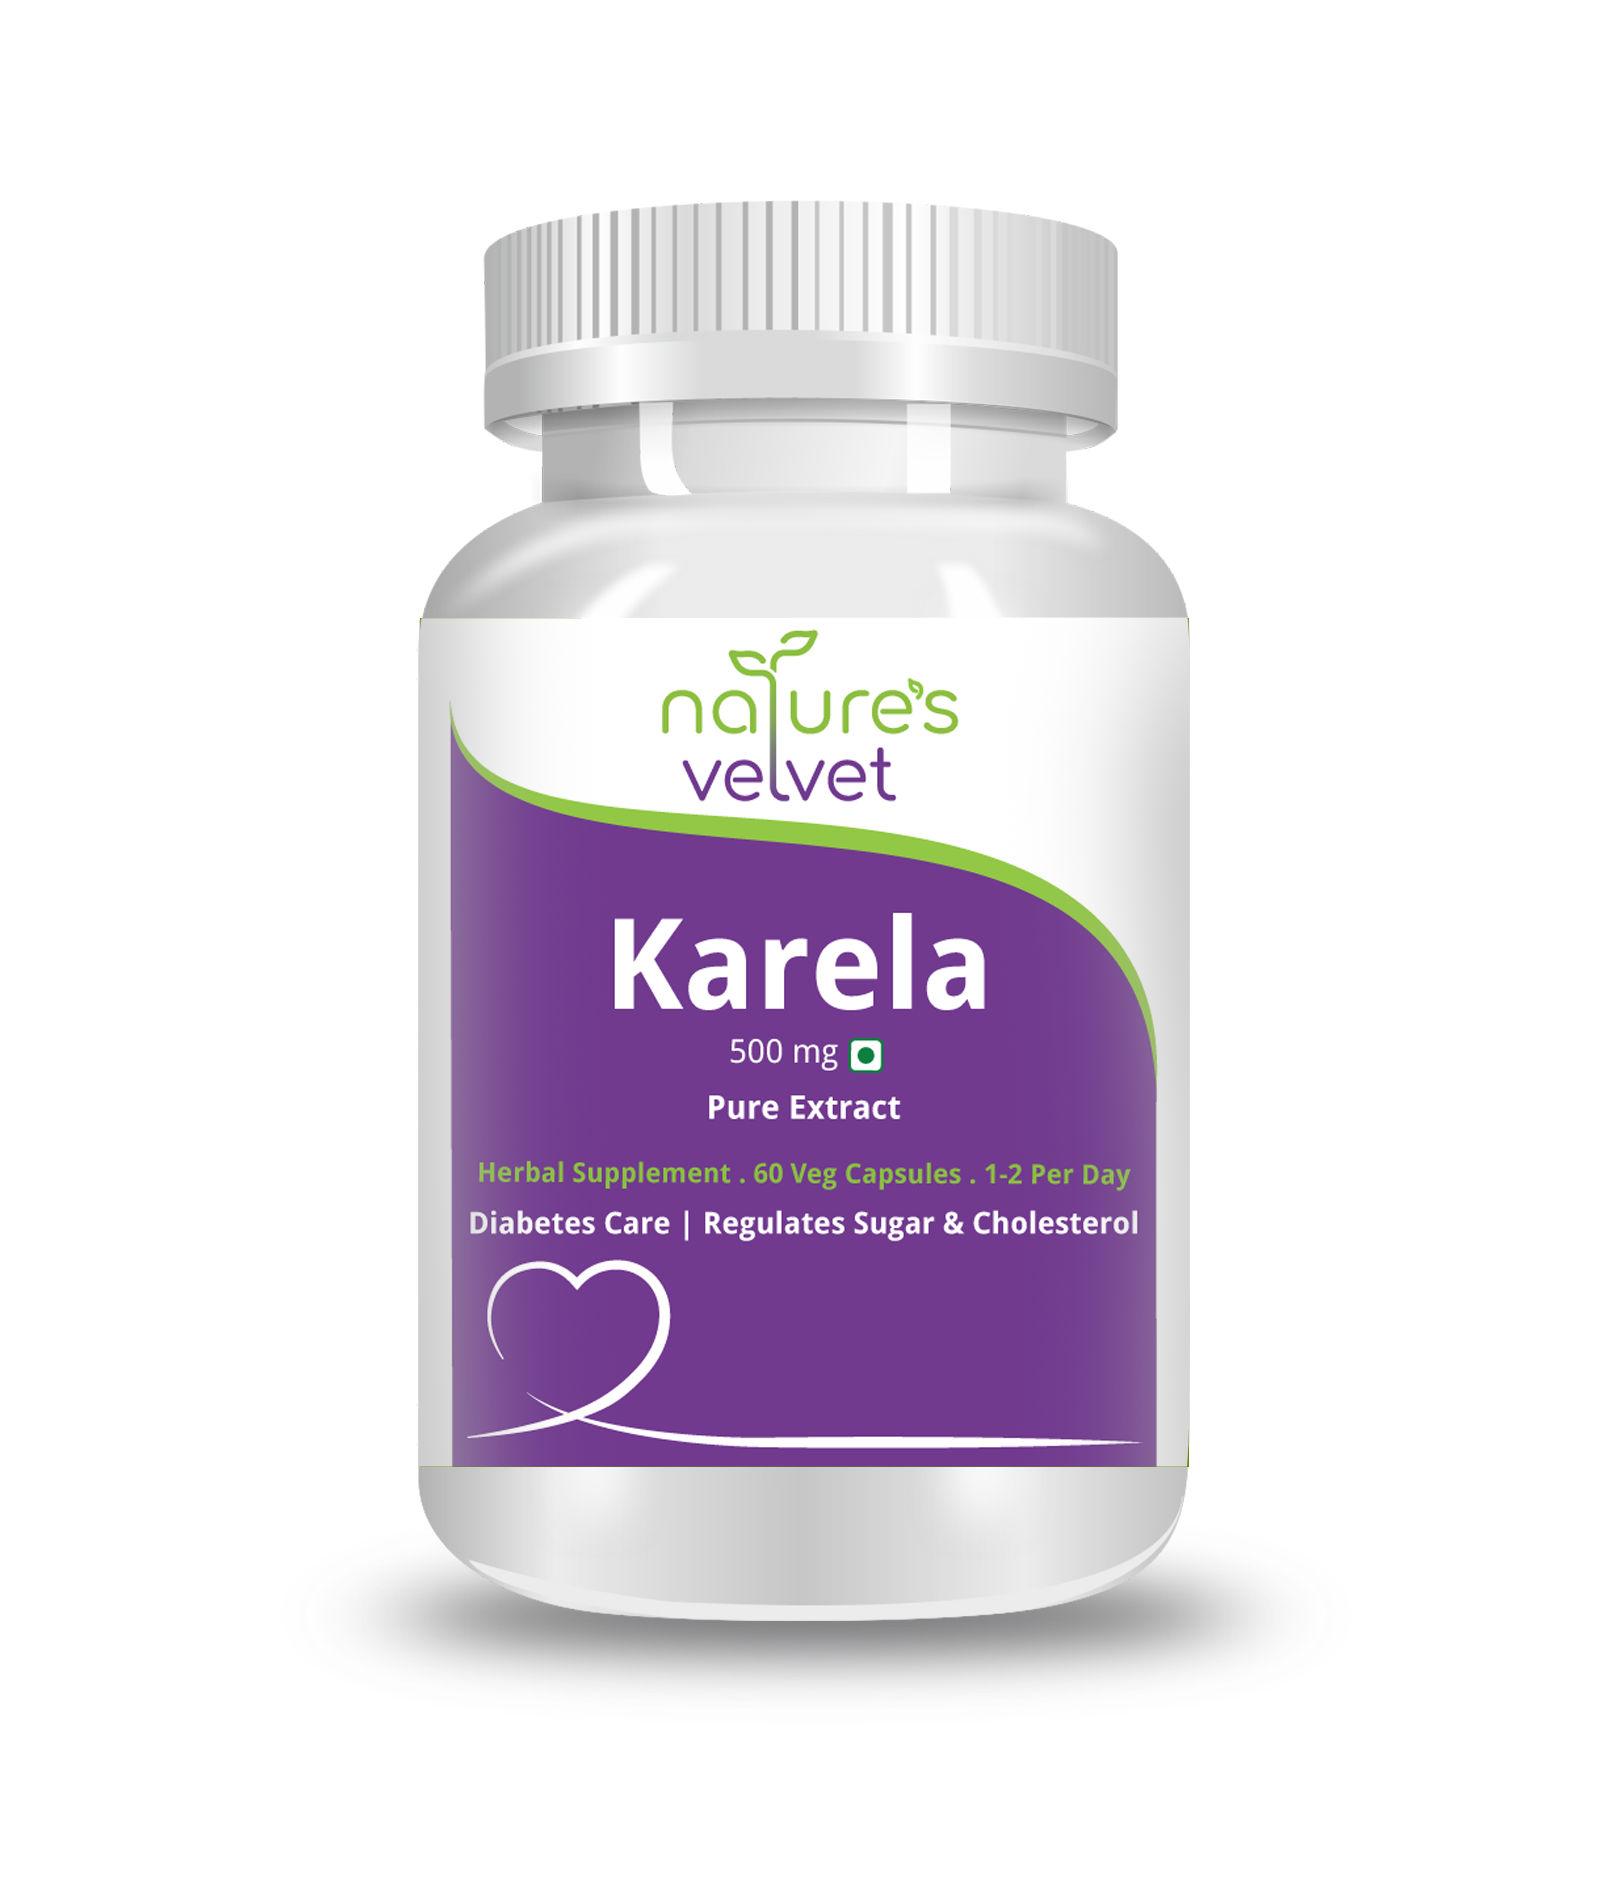 Nature's Velvet Karela Pure Extract 500mg 60 Veg Capsules